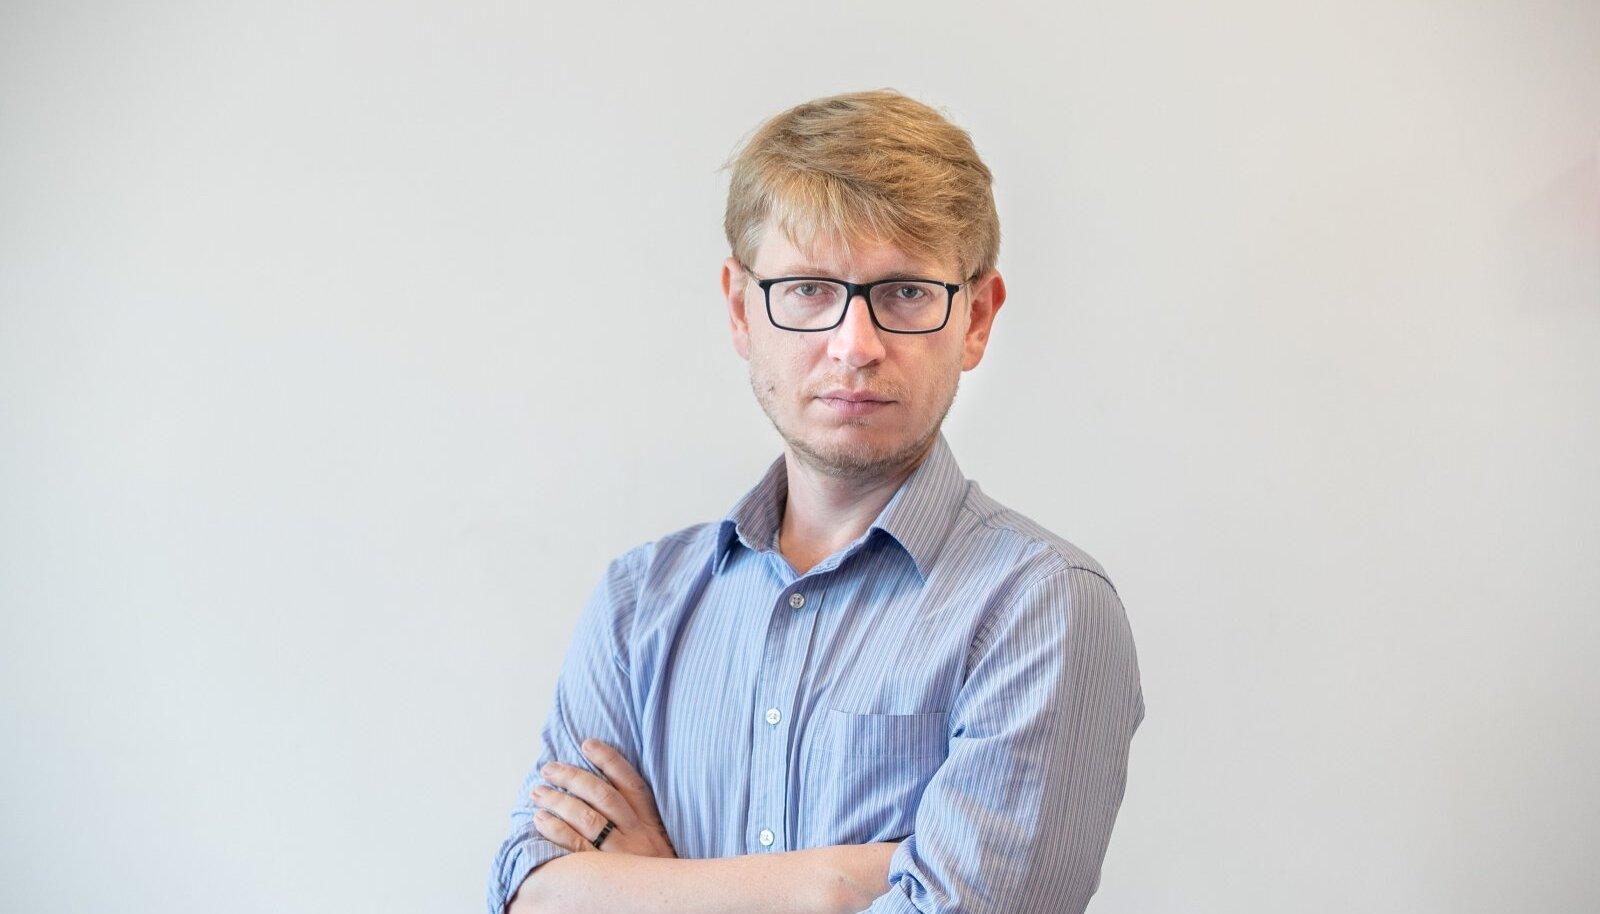 Andrei Shumakov